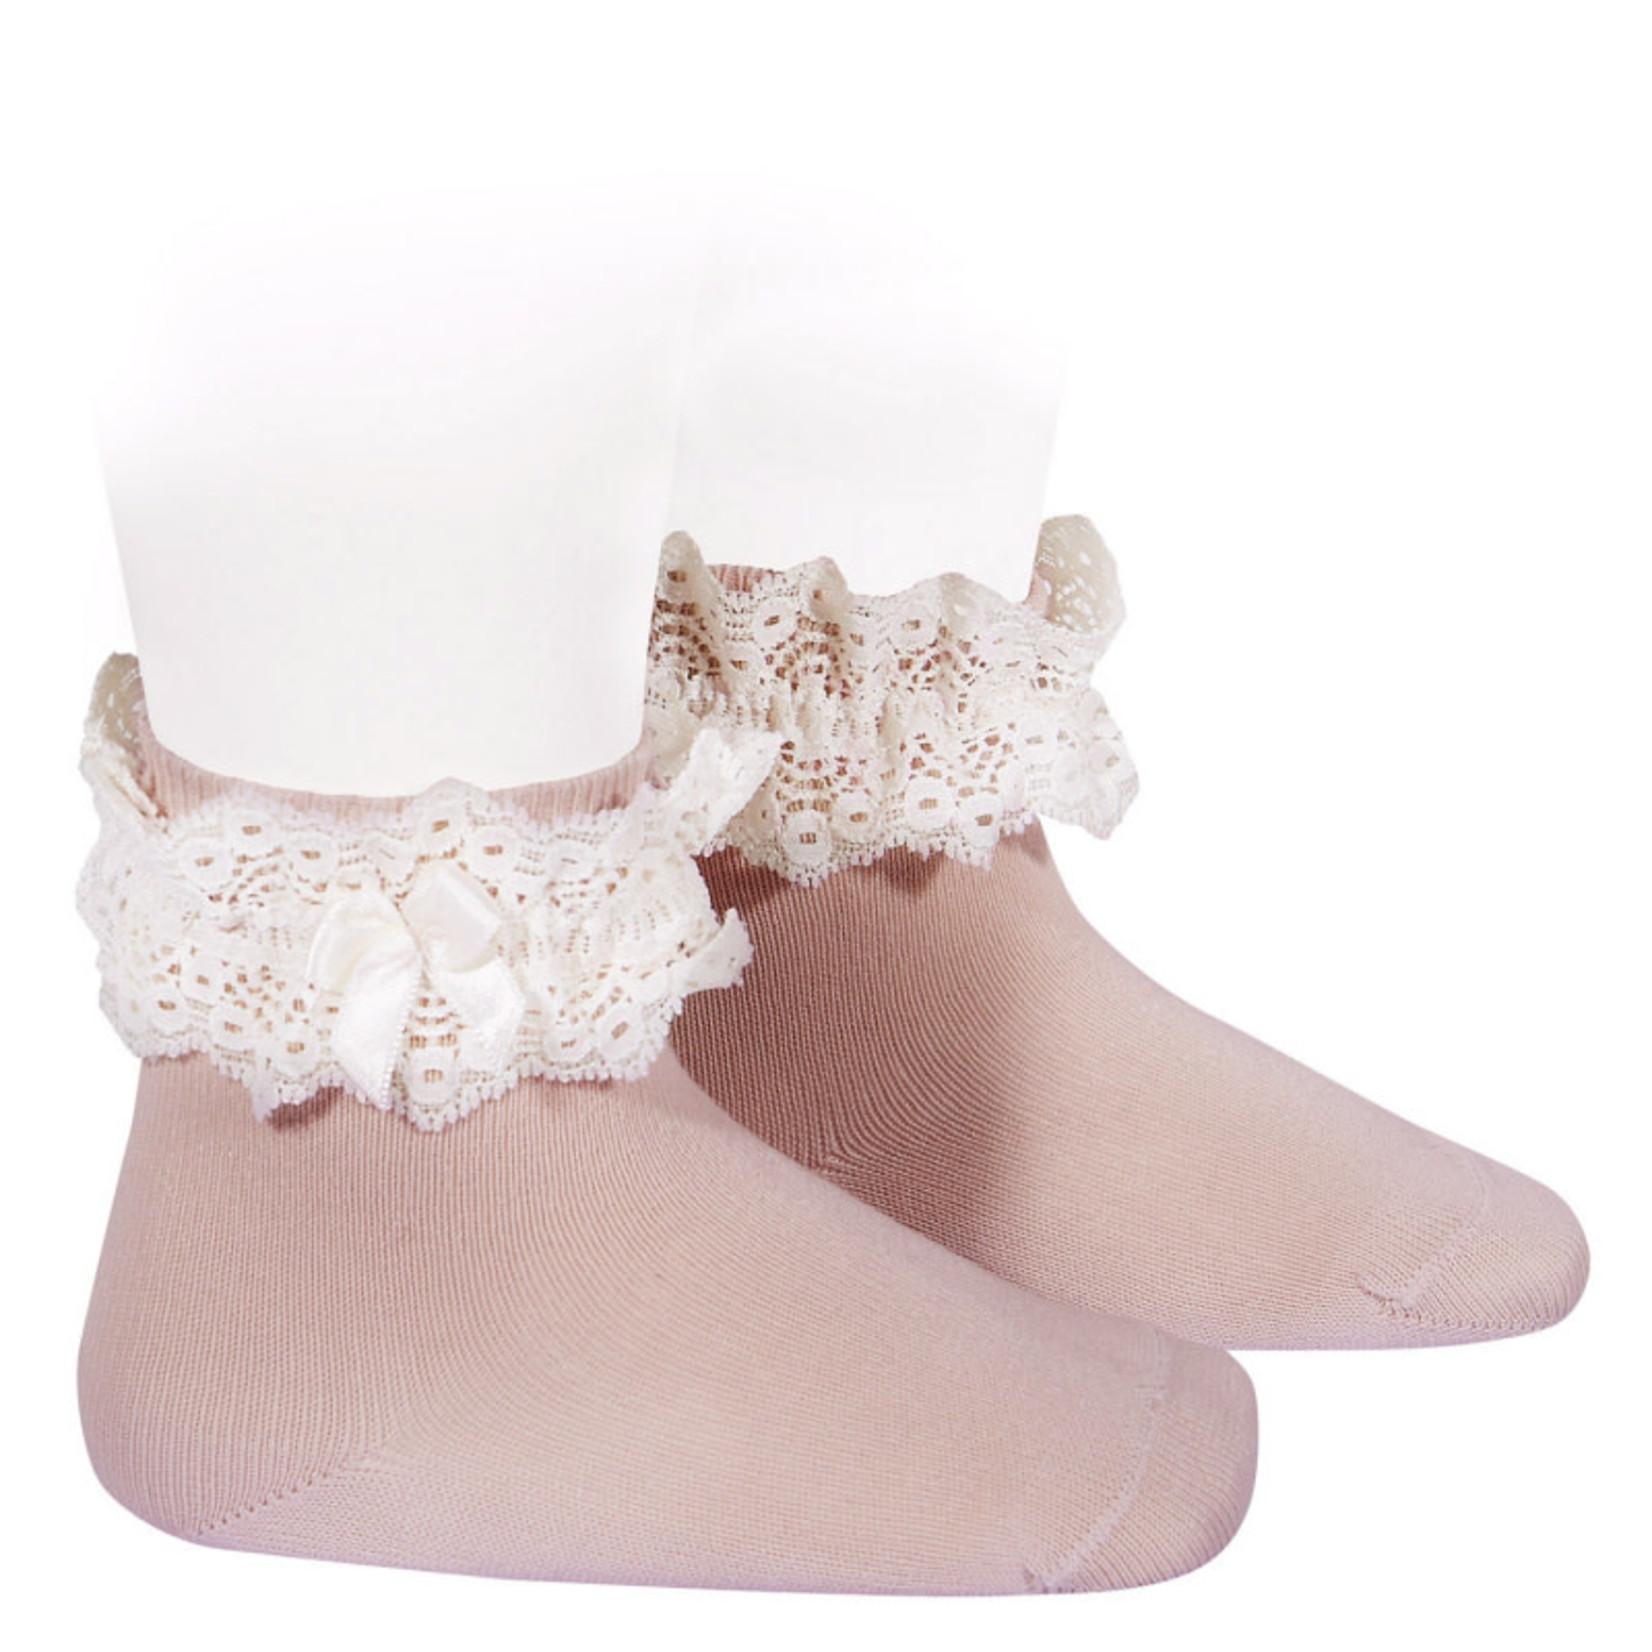 Condor Socks Lace Trim - Pale Pink